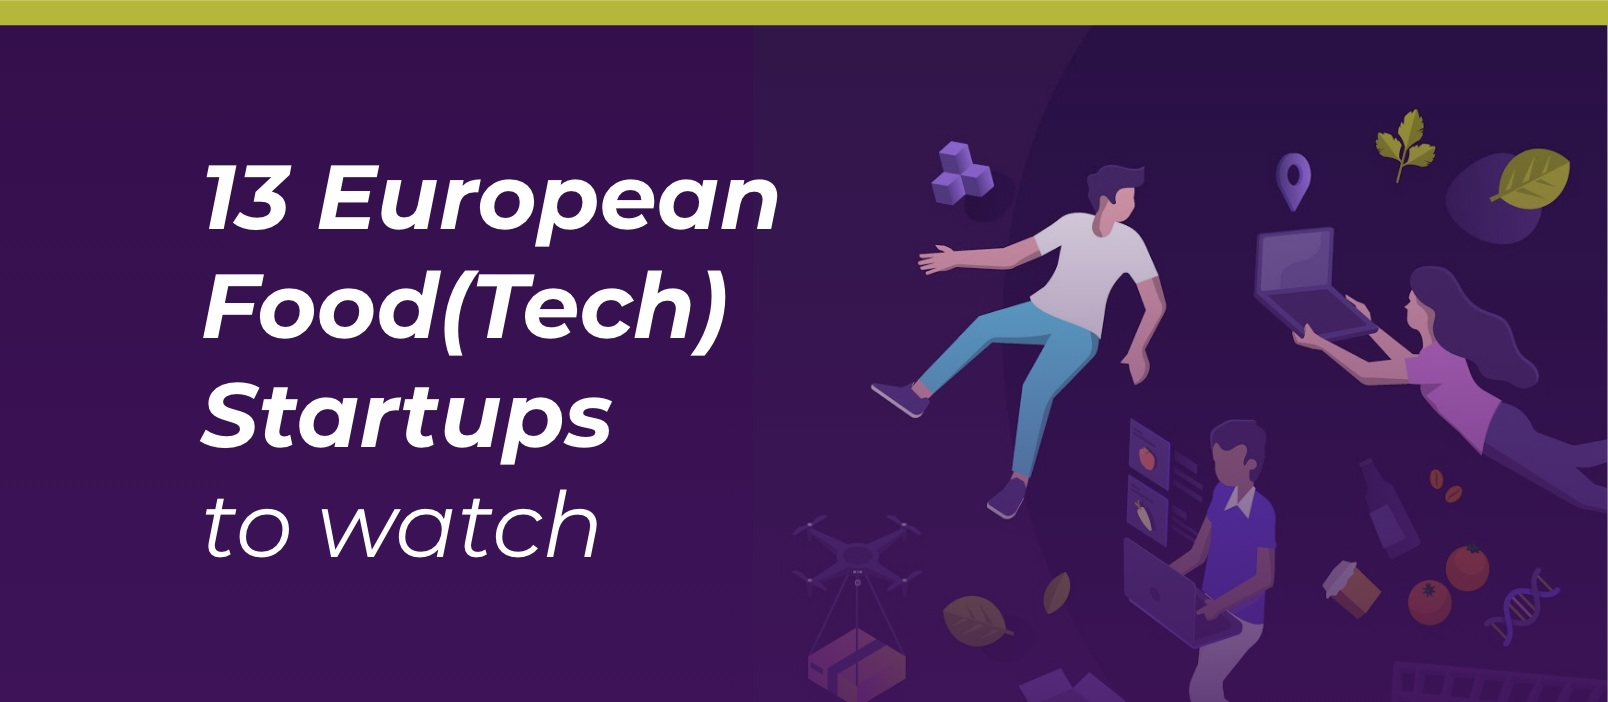 13 European Food(Tech) Startups to Watch